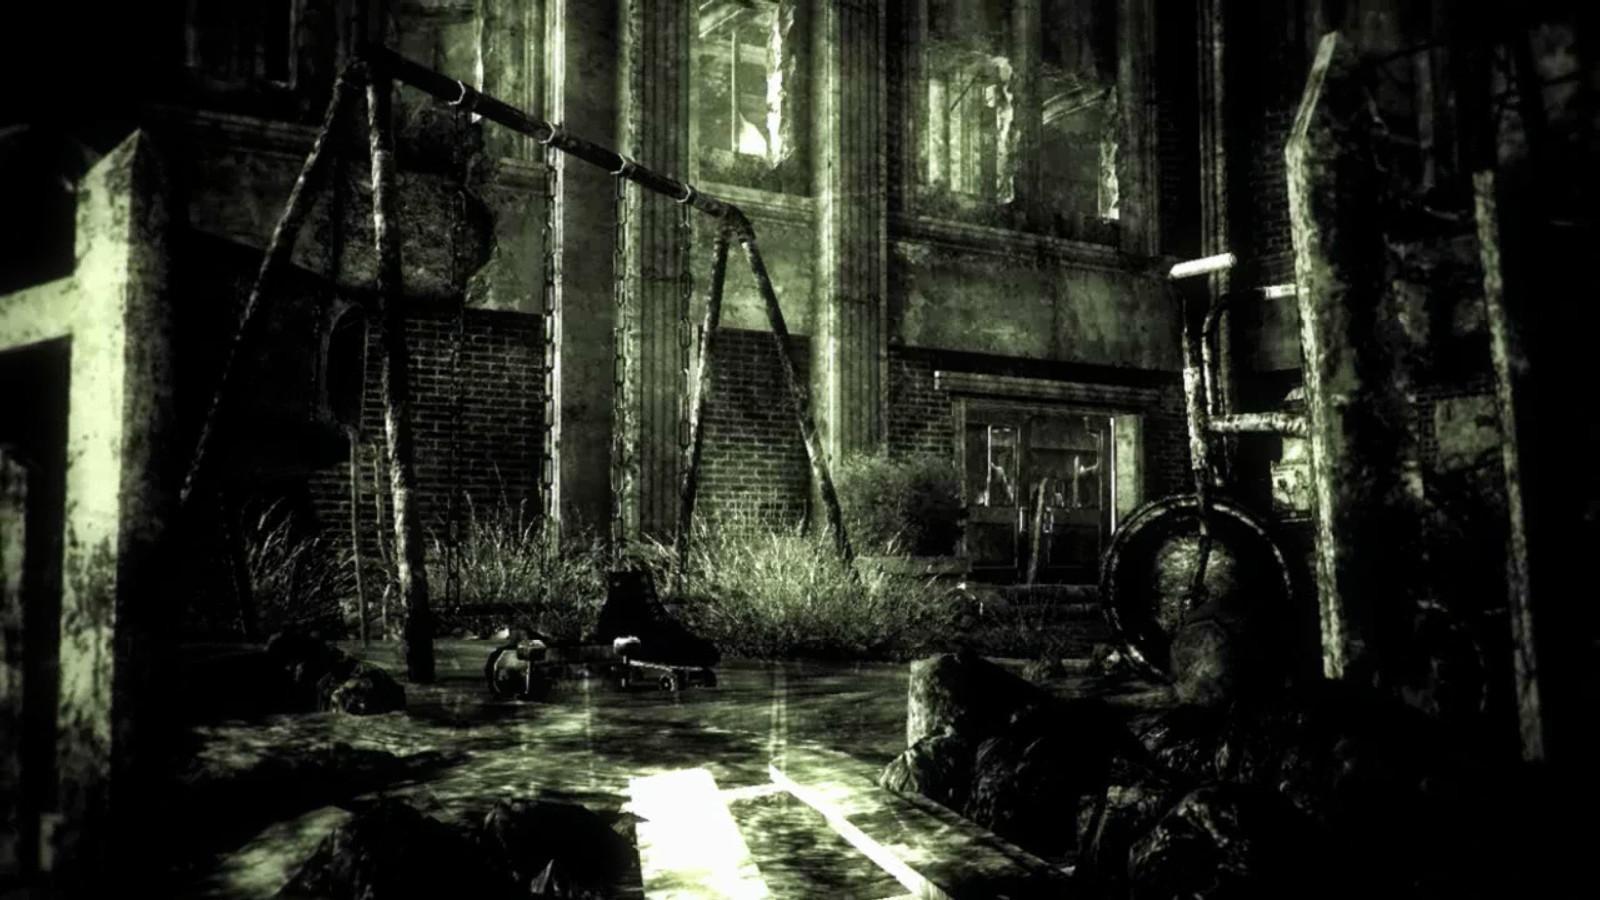 wallpaper : forest, video games, monochrome, jungle, swamp, midnight